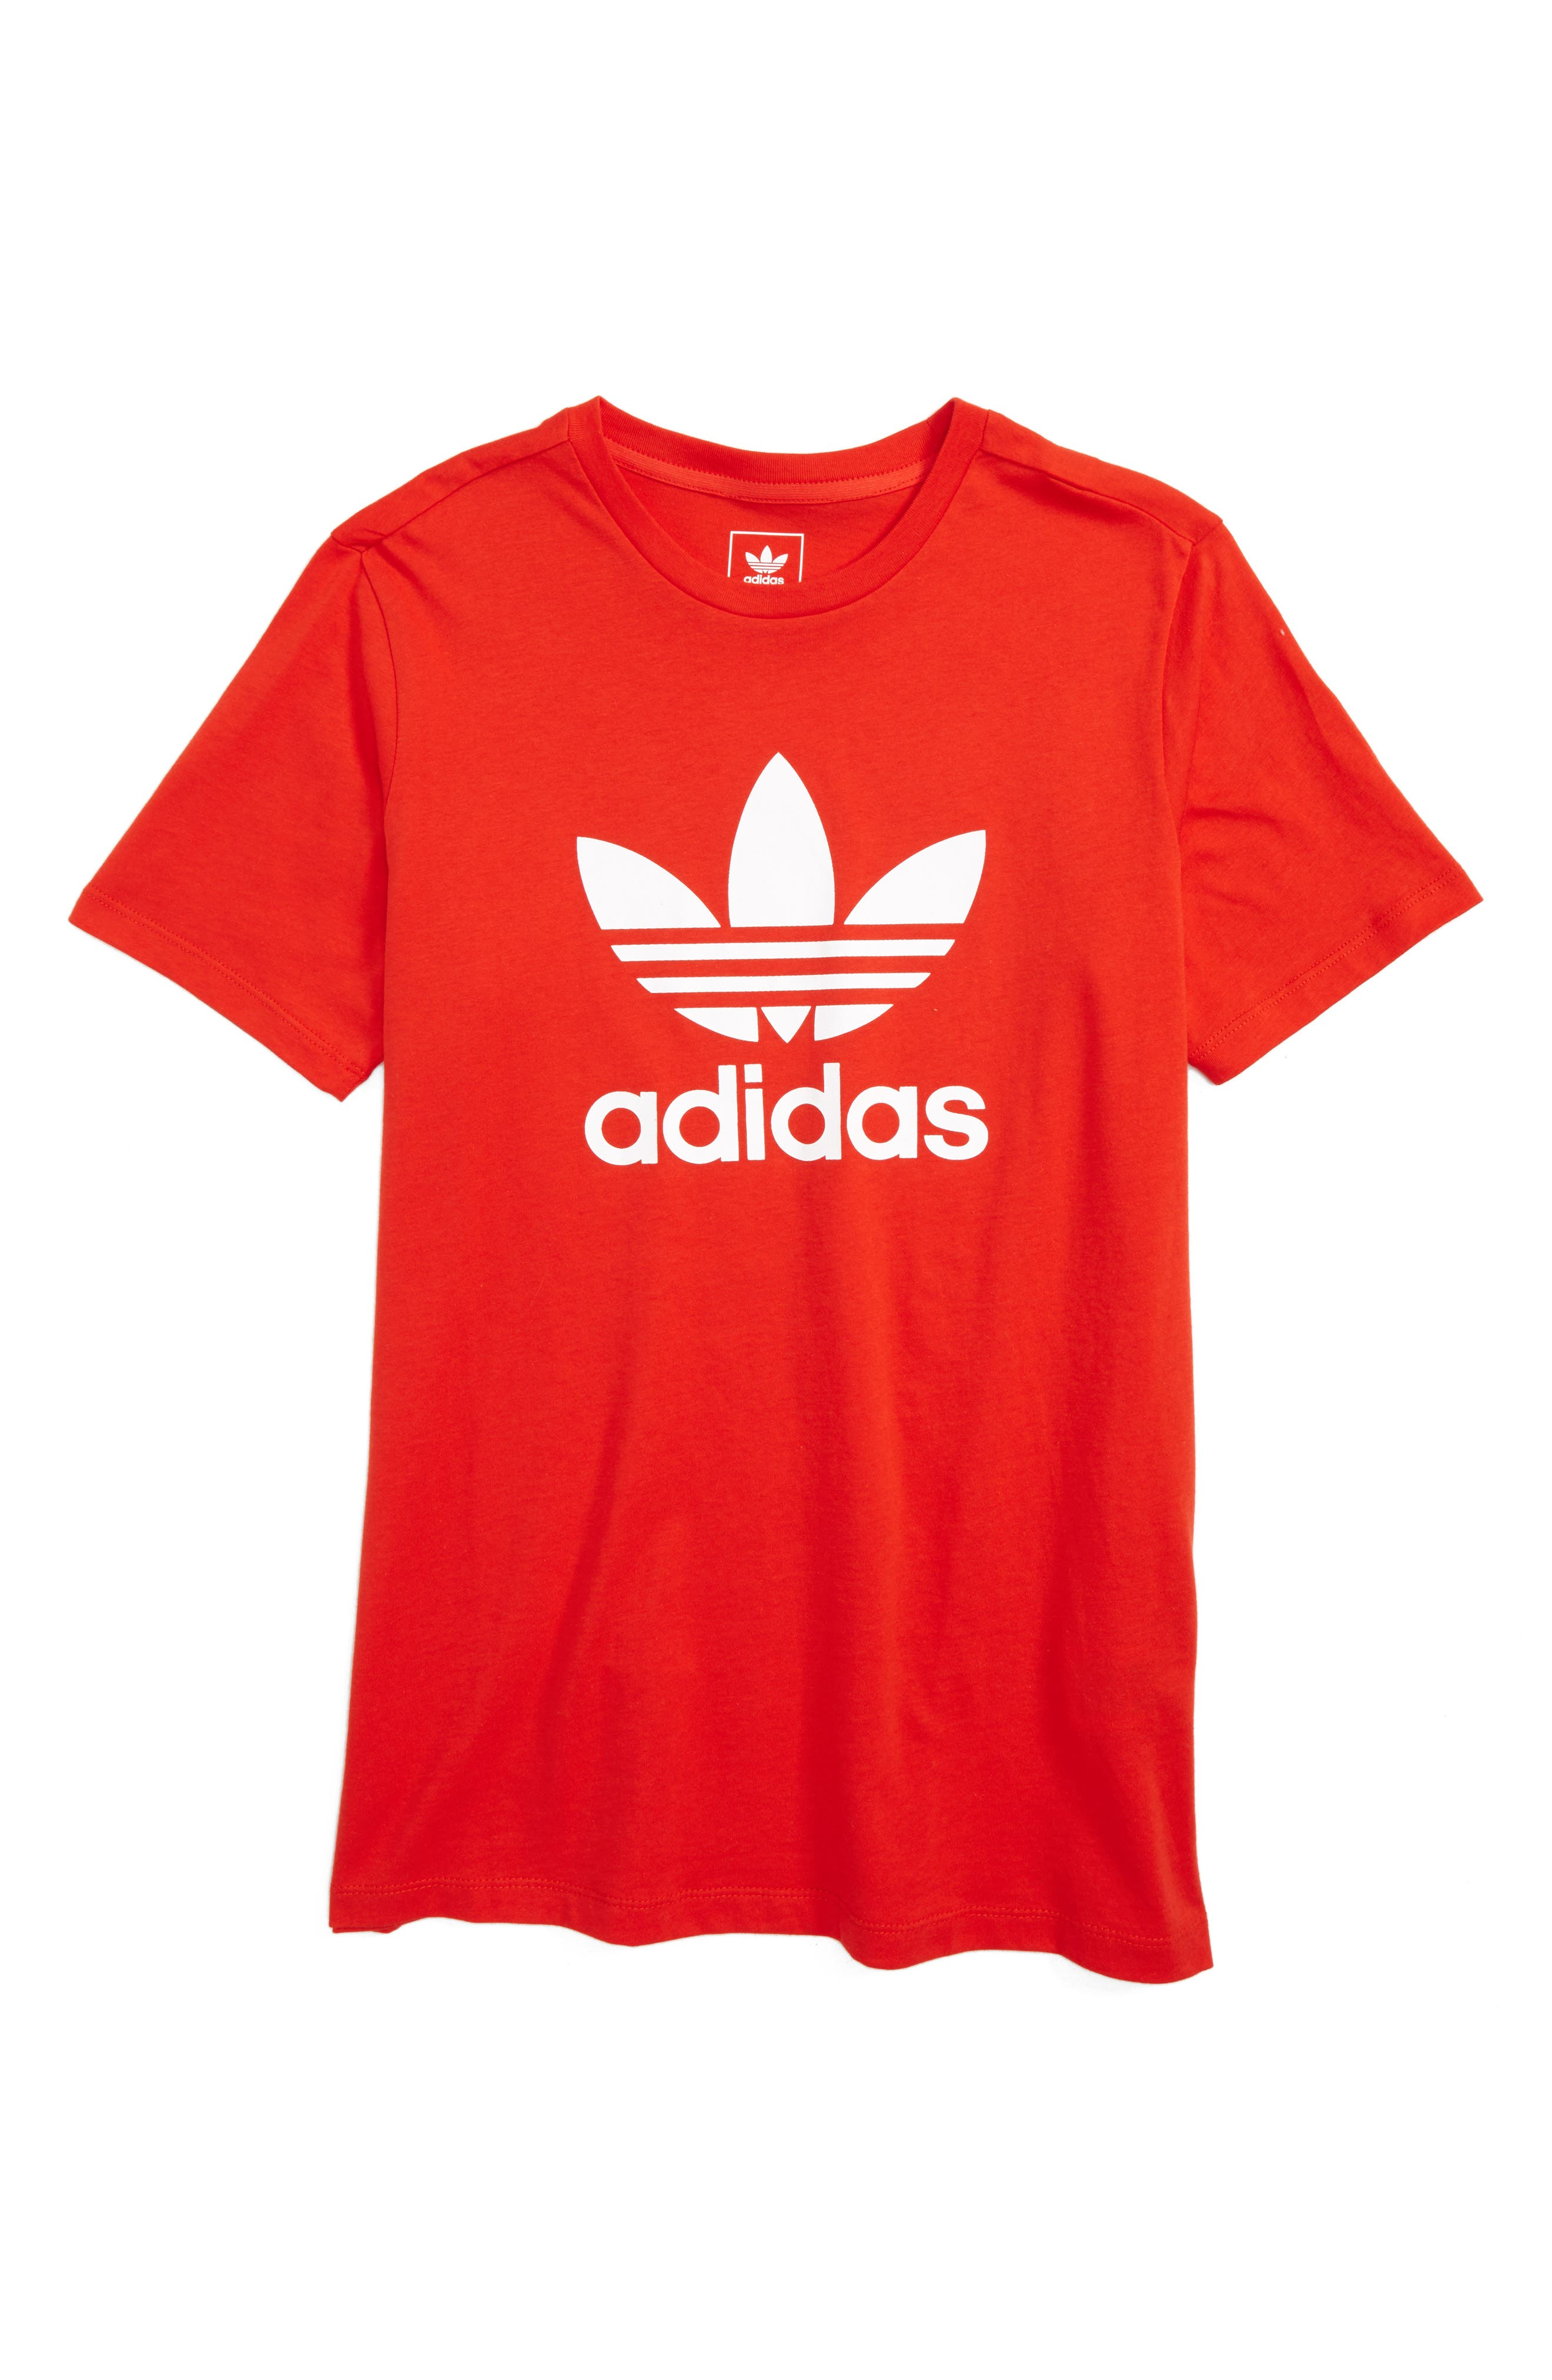 adidas Originals Logo Tee (Big Girls)